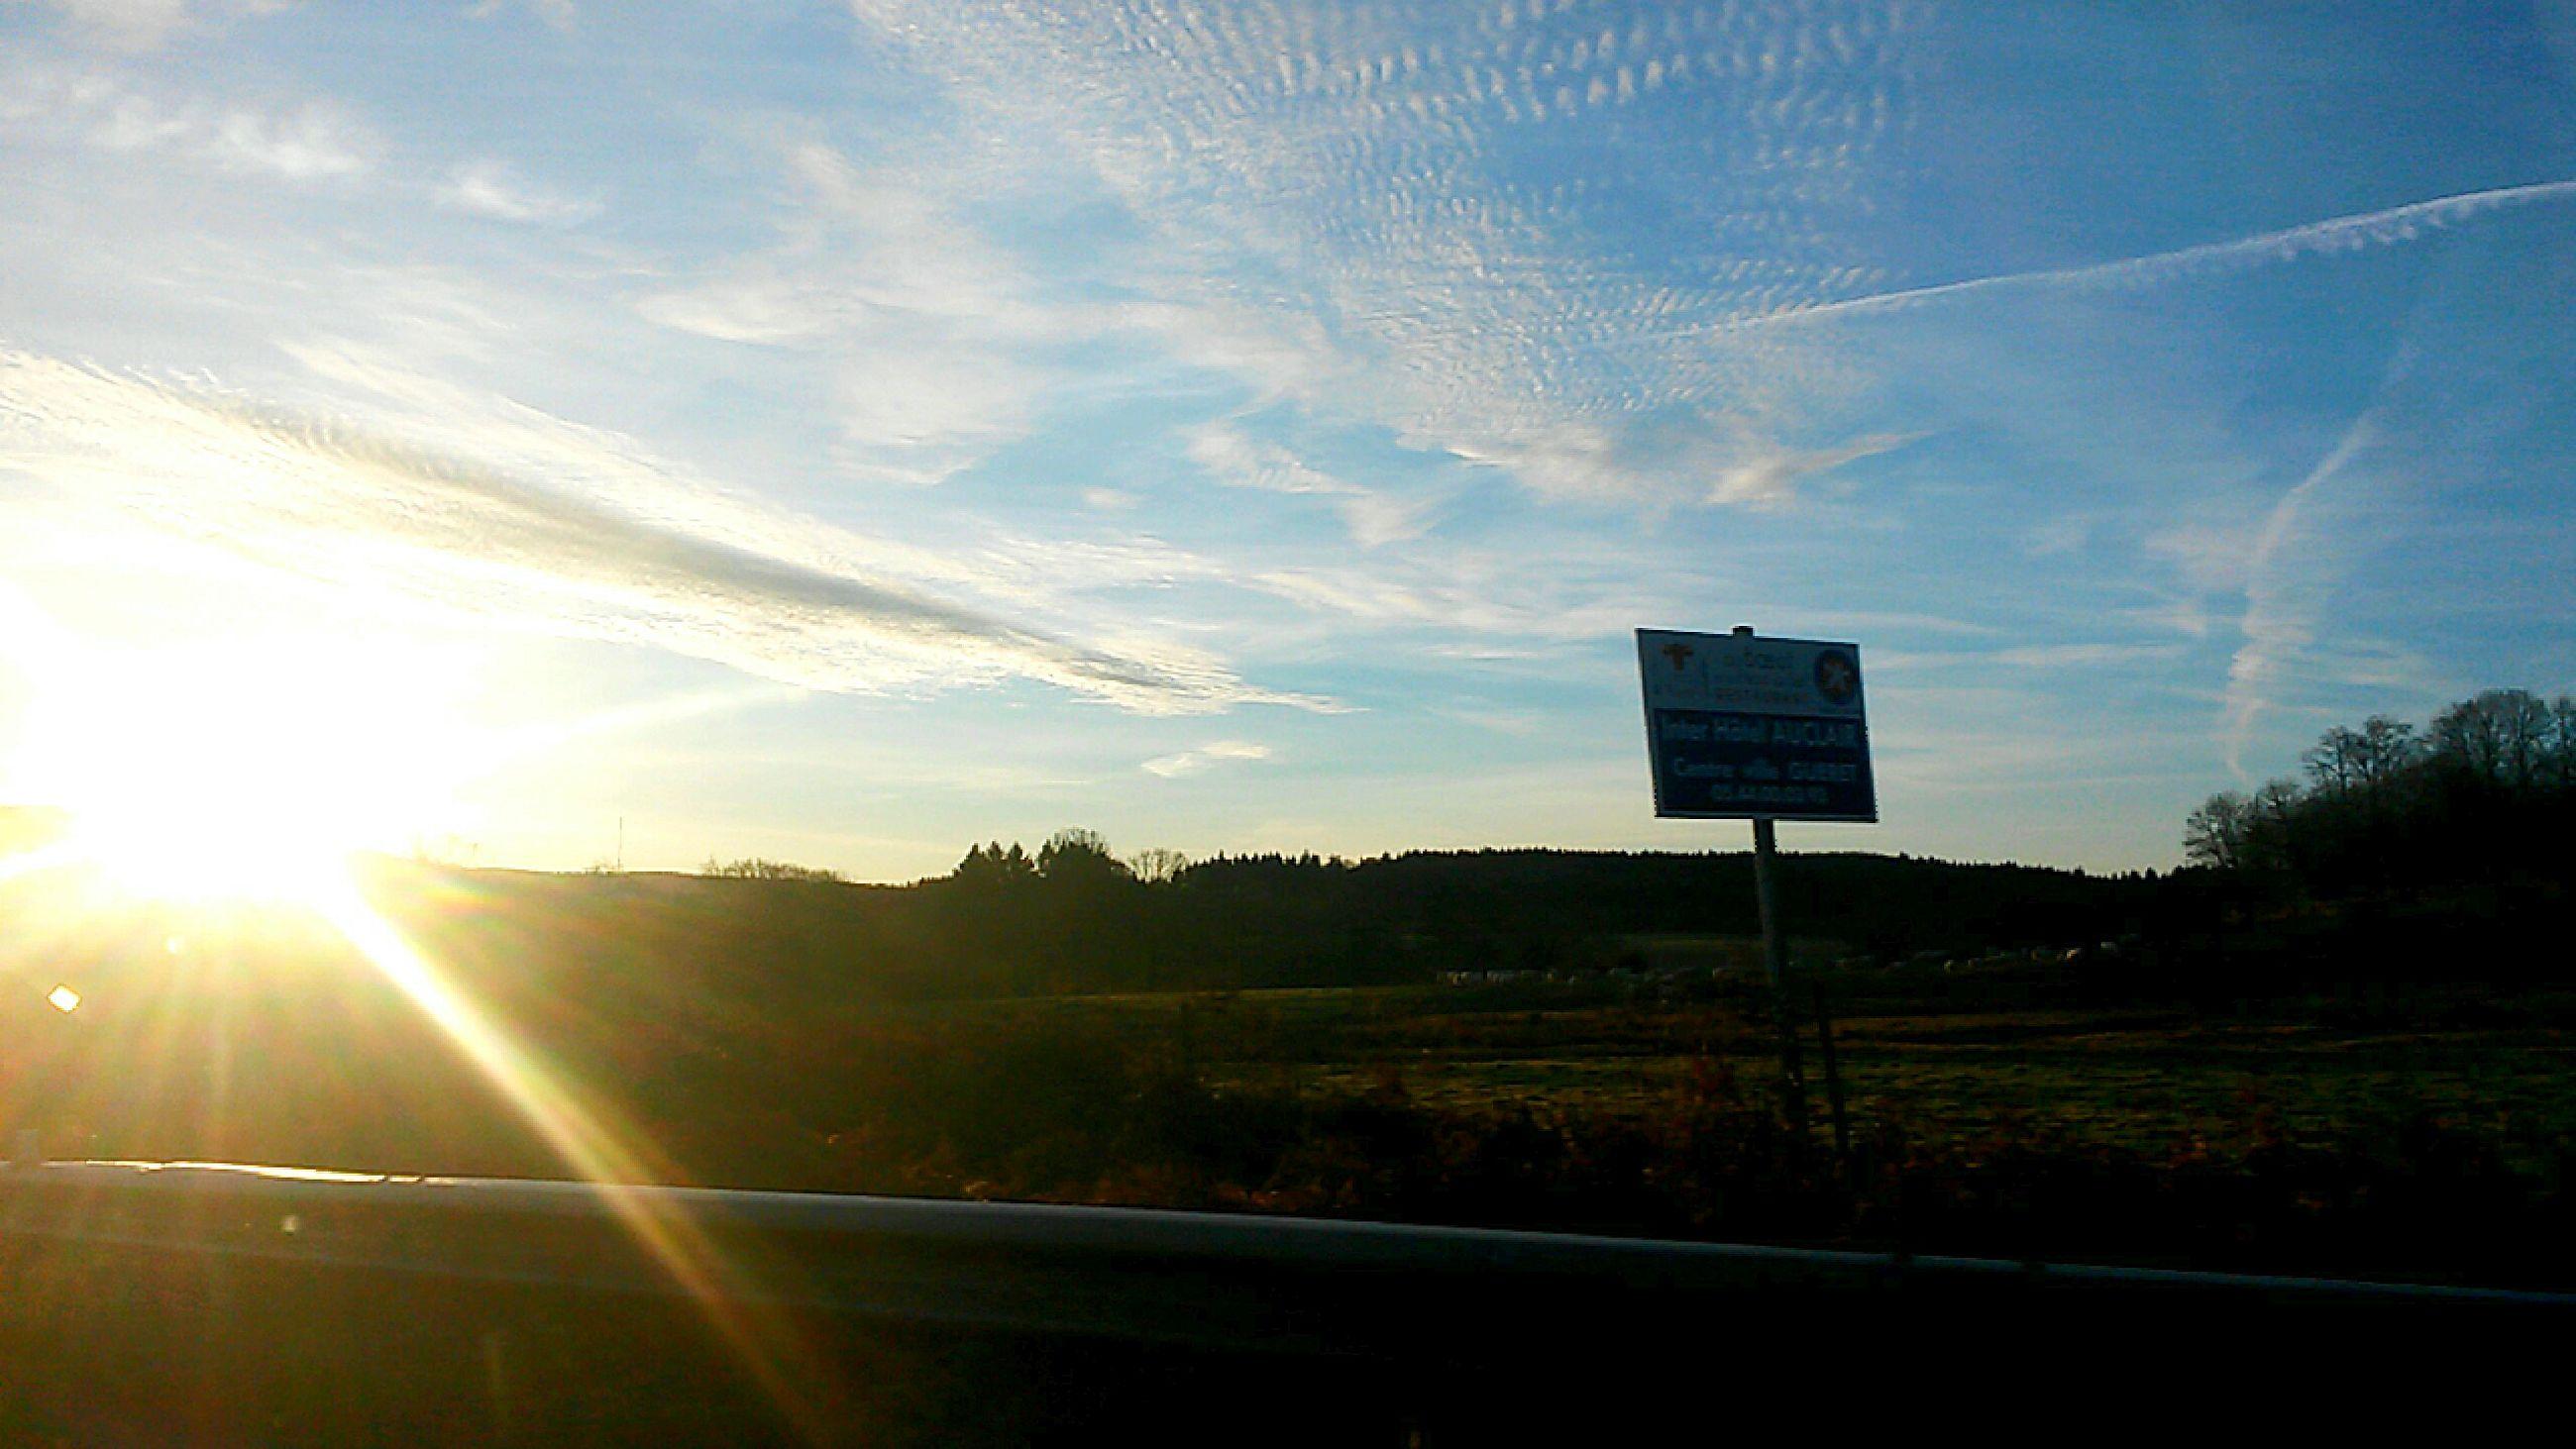 tree, sky, landscape, sun, transportation, sunset, tranquility, sunlight, scenics, field, tranquil scene, nature, road, sunbeam, beauty in nature, cloud - sky, no people, lens flare, silhouette, cloud